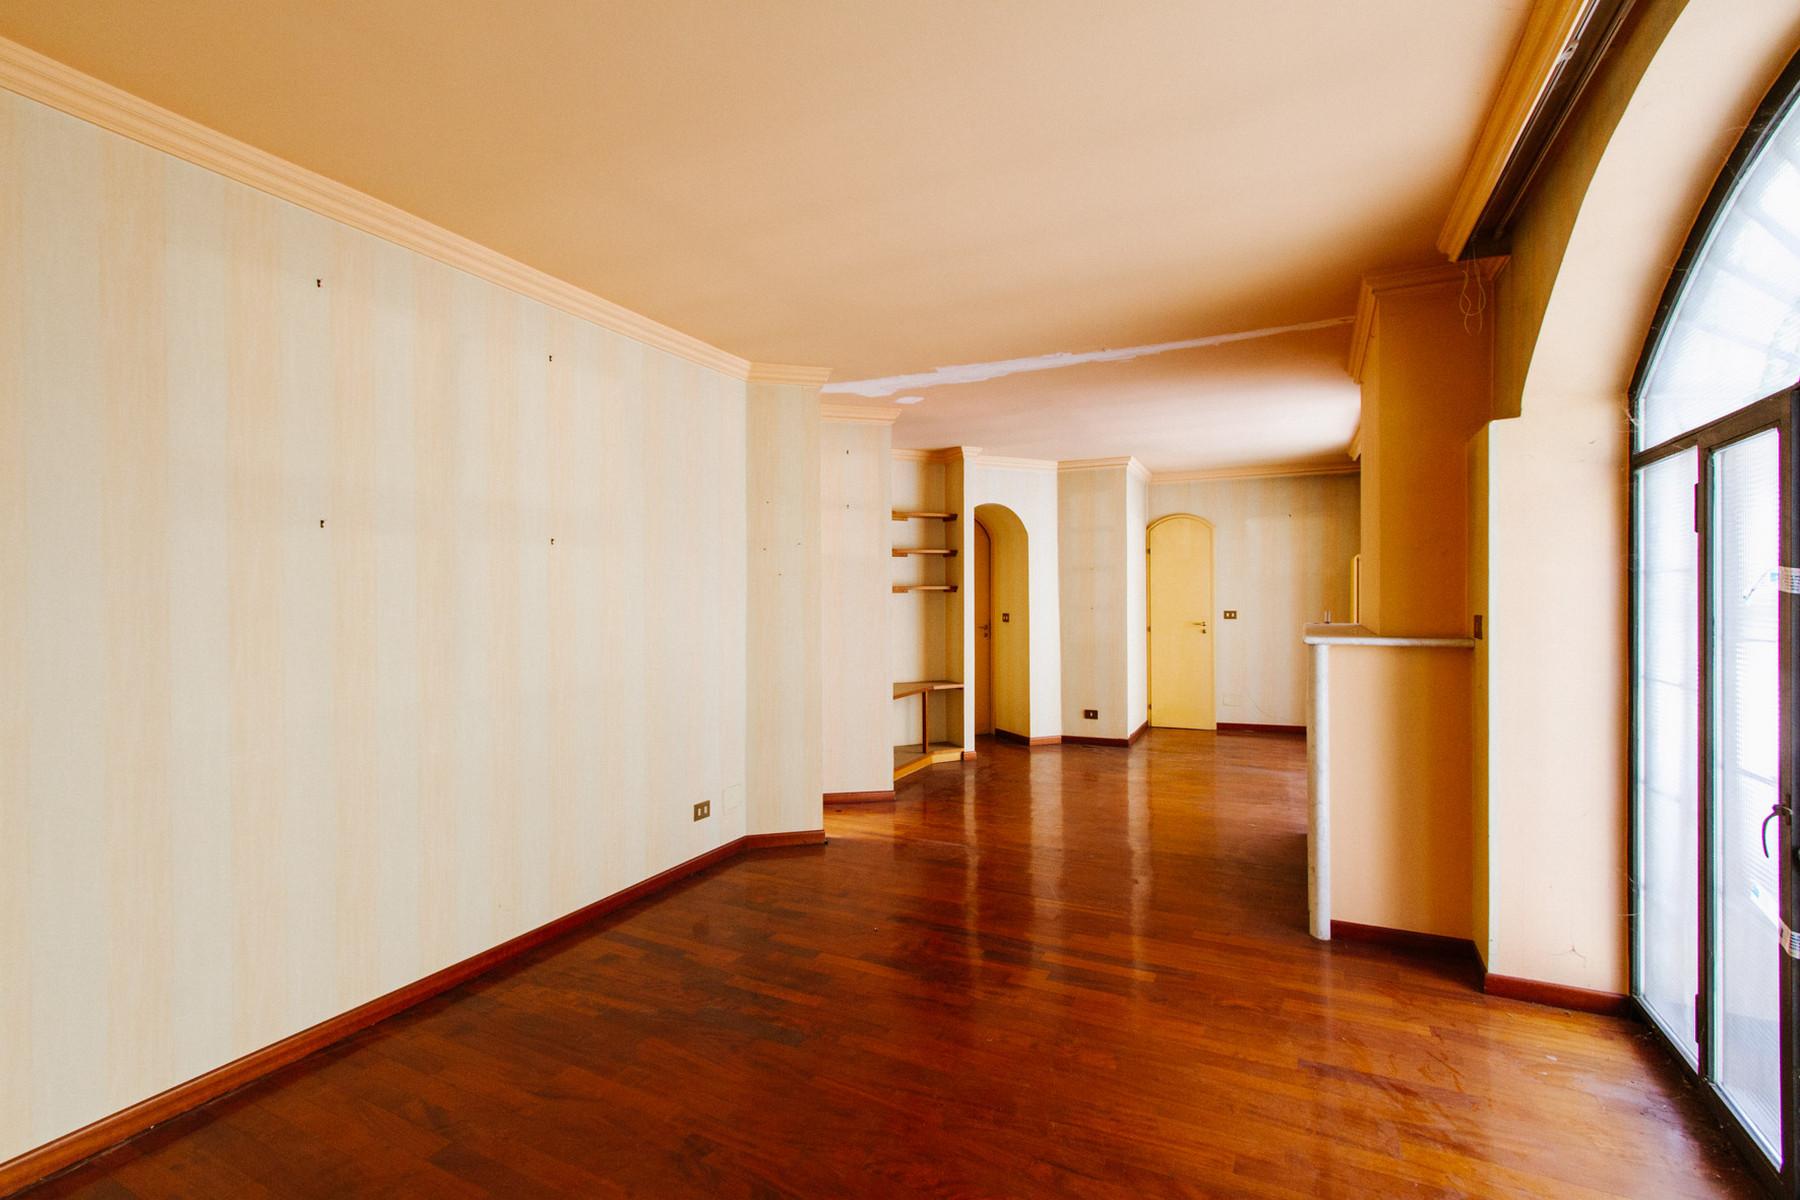 Casa indipendente in Vendita a Torino: 5 locali, 699 mq - Foto 9